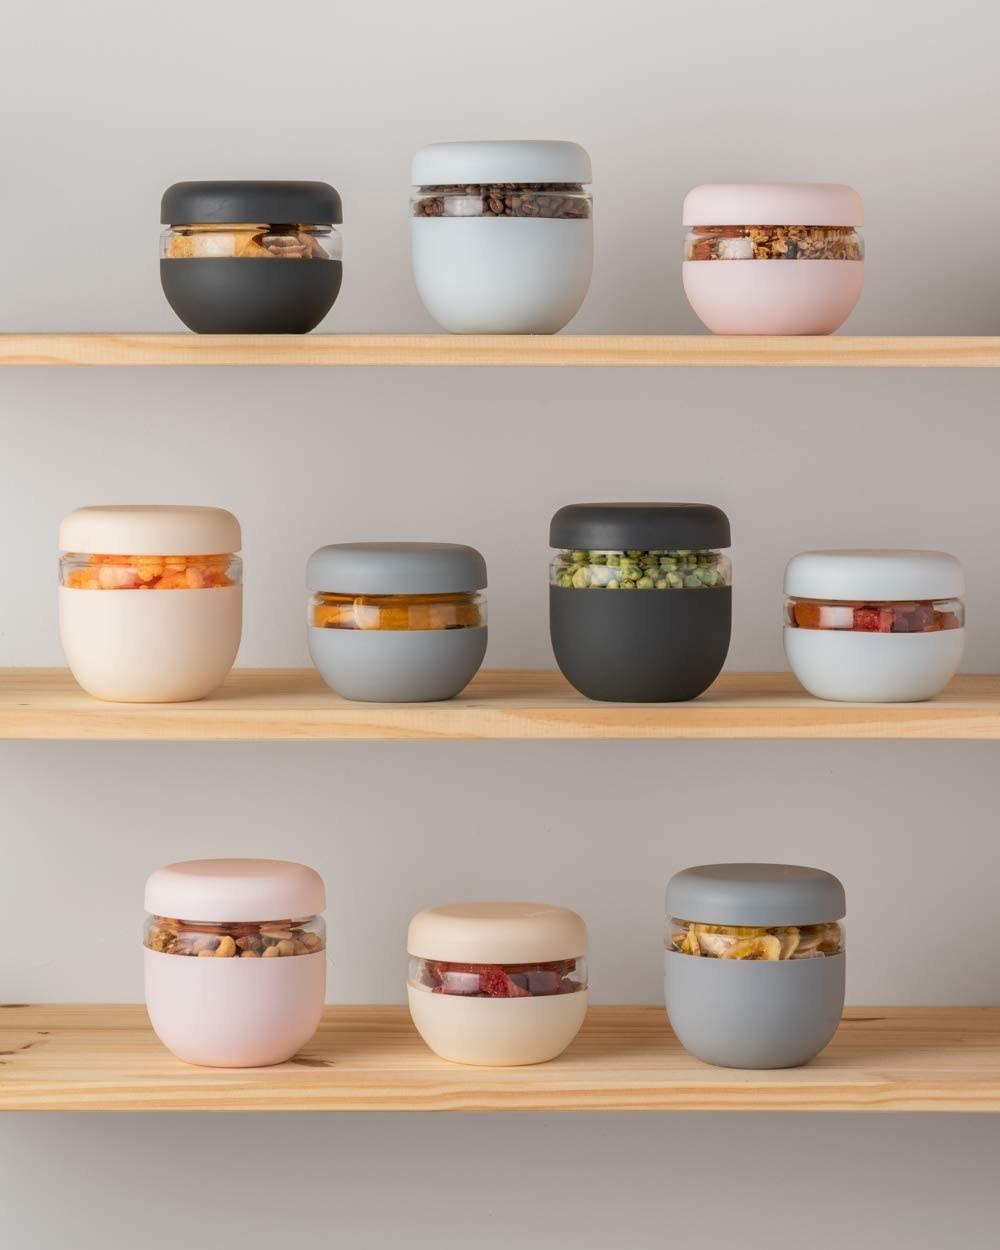 The jars holding snacks